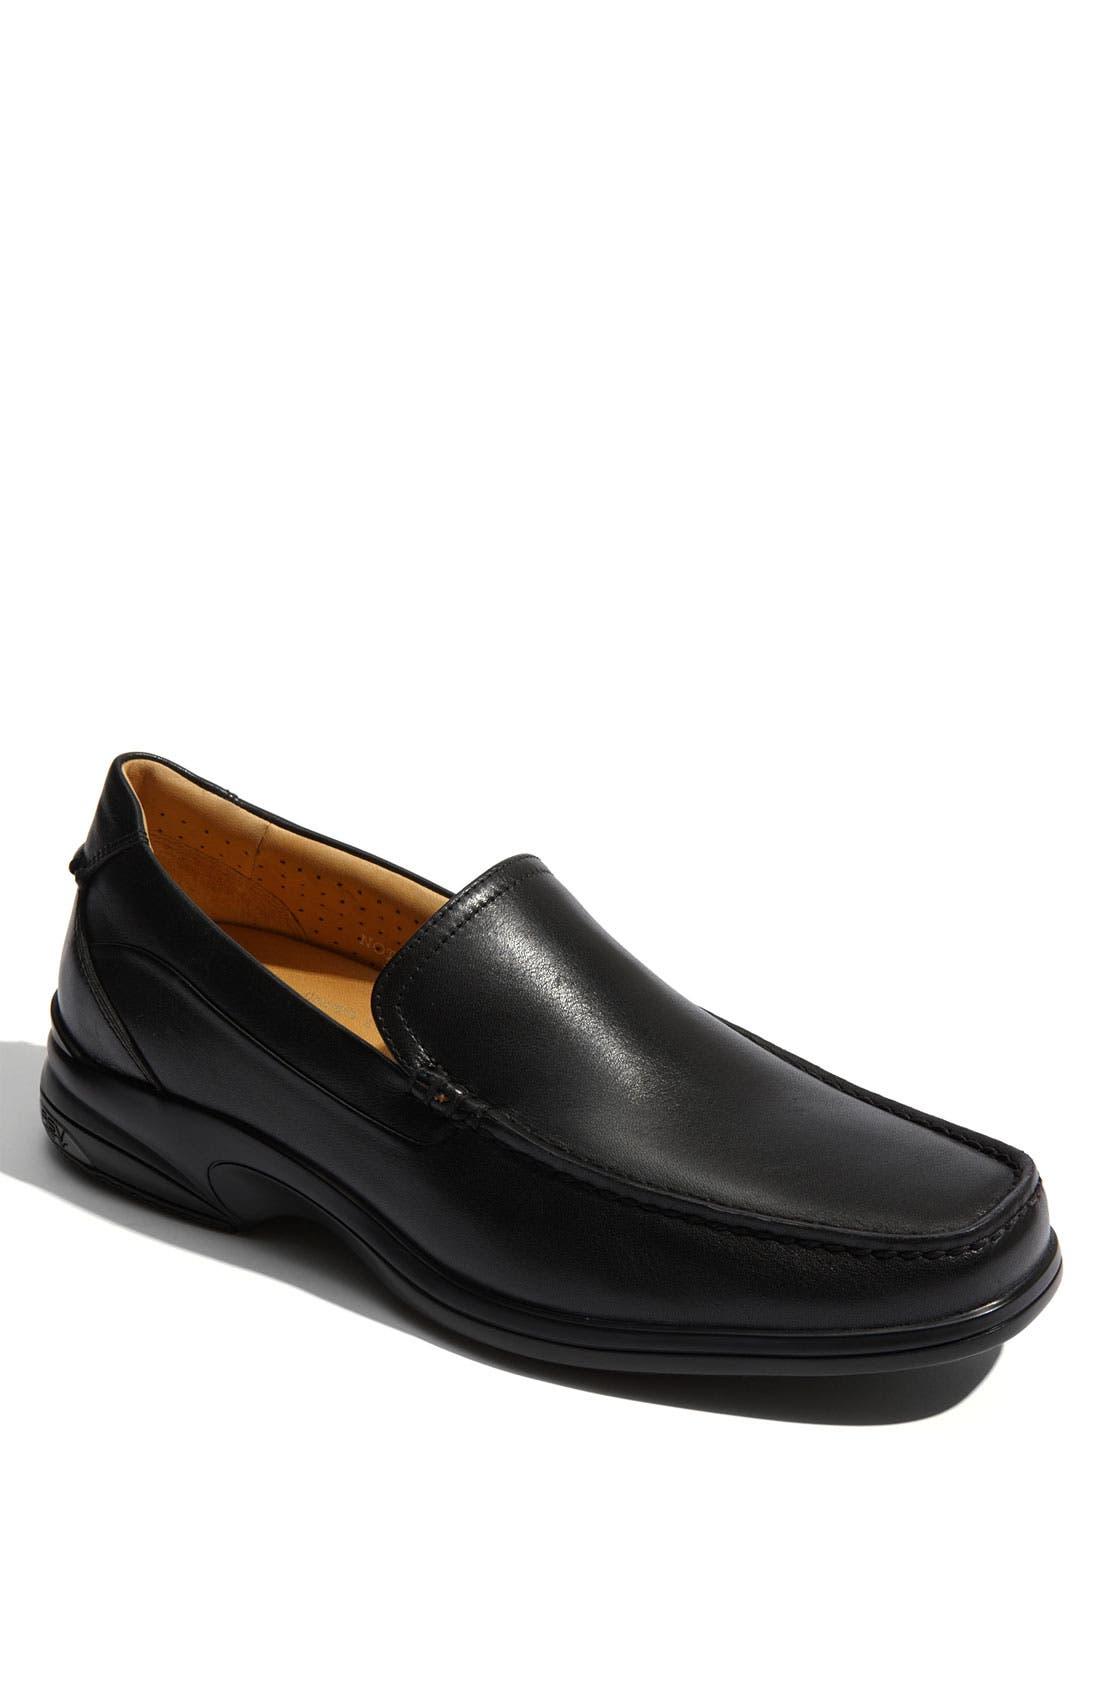 Alternate Image 1 Selected - Sperry Top-Sider® 'Gold ASV Venetian' Loafer (Men)